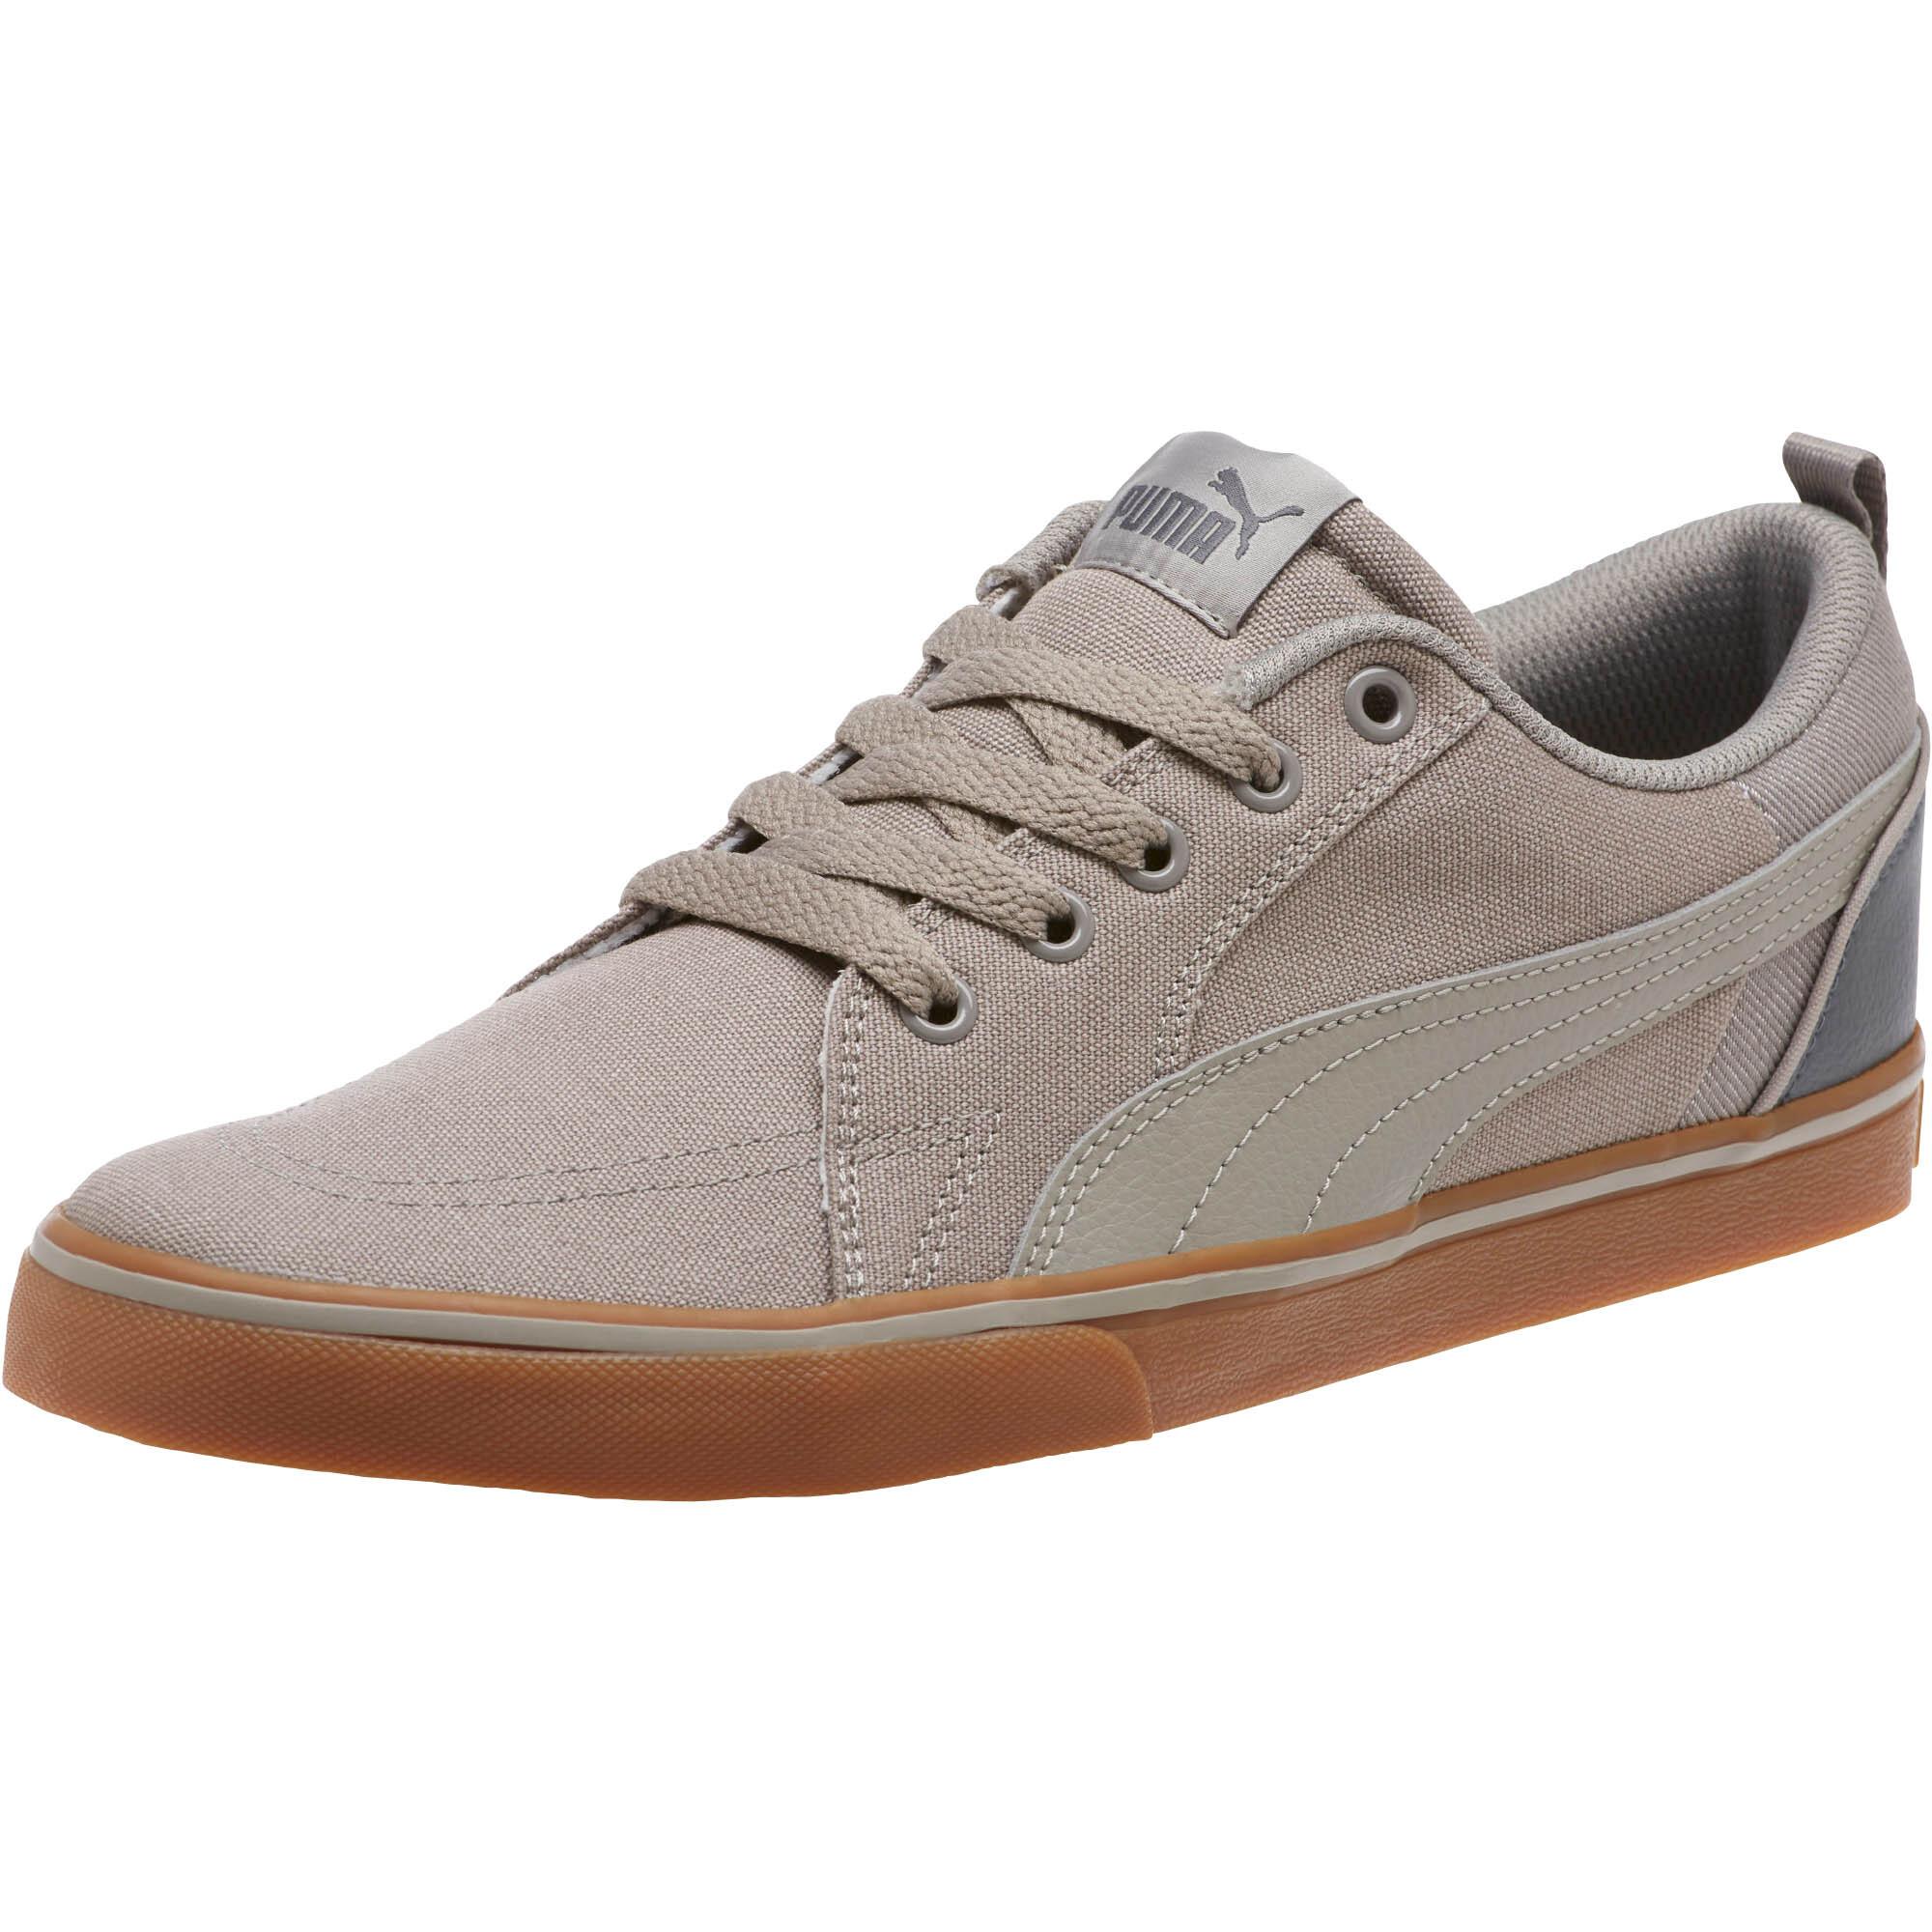 PUMA-PUMA-Bridger-Men-039-s-Sneakers-Men-Shoe-Basics thumbnail 10